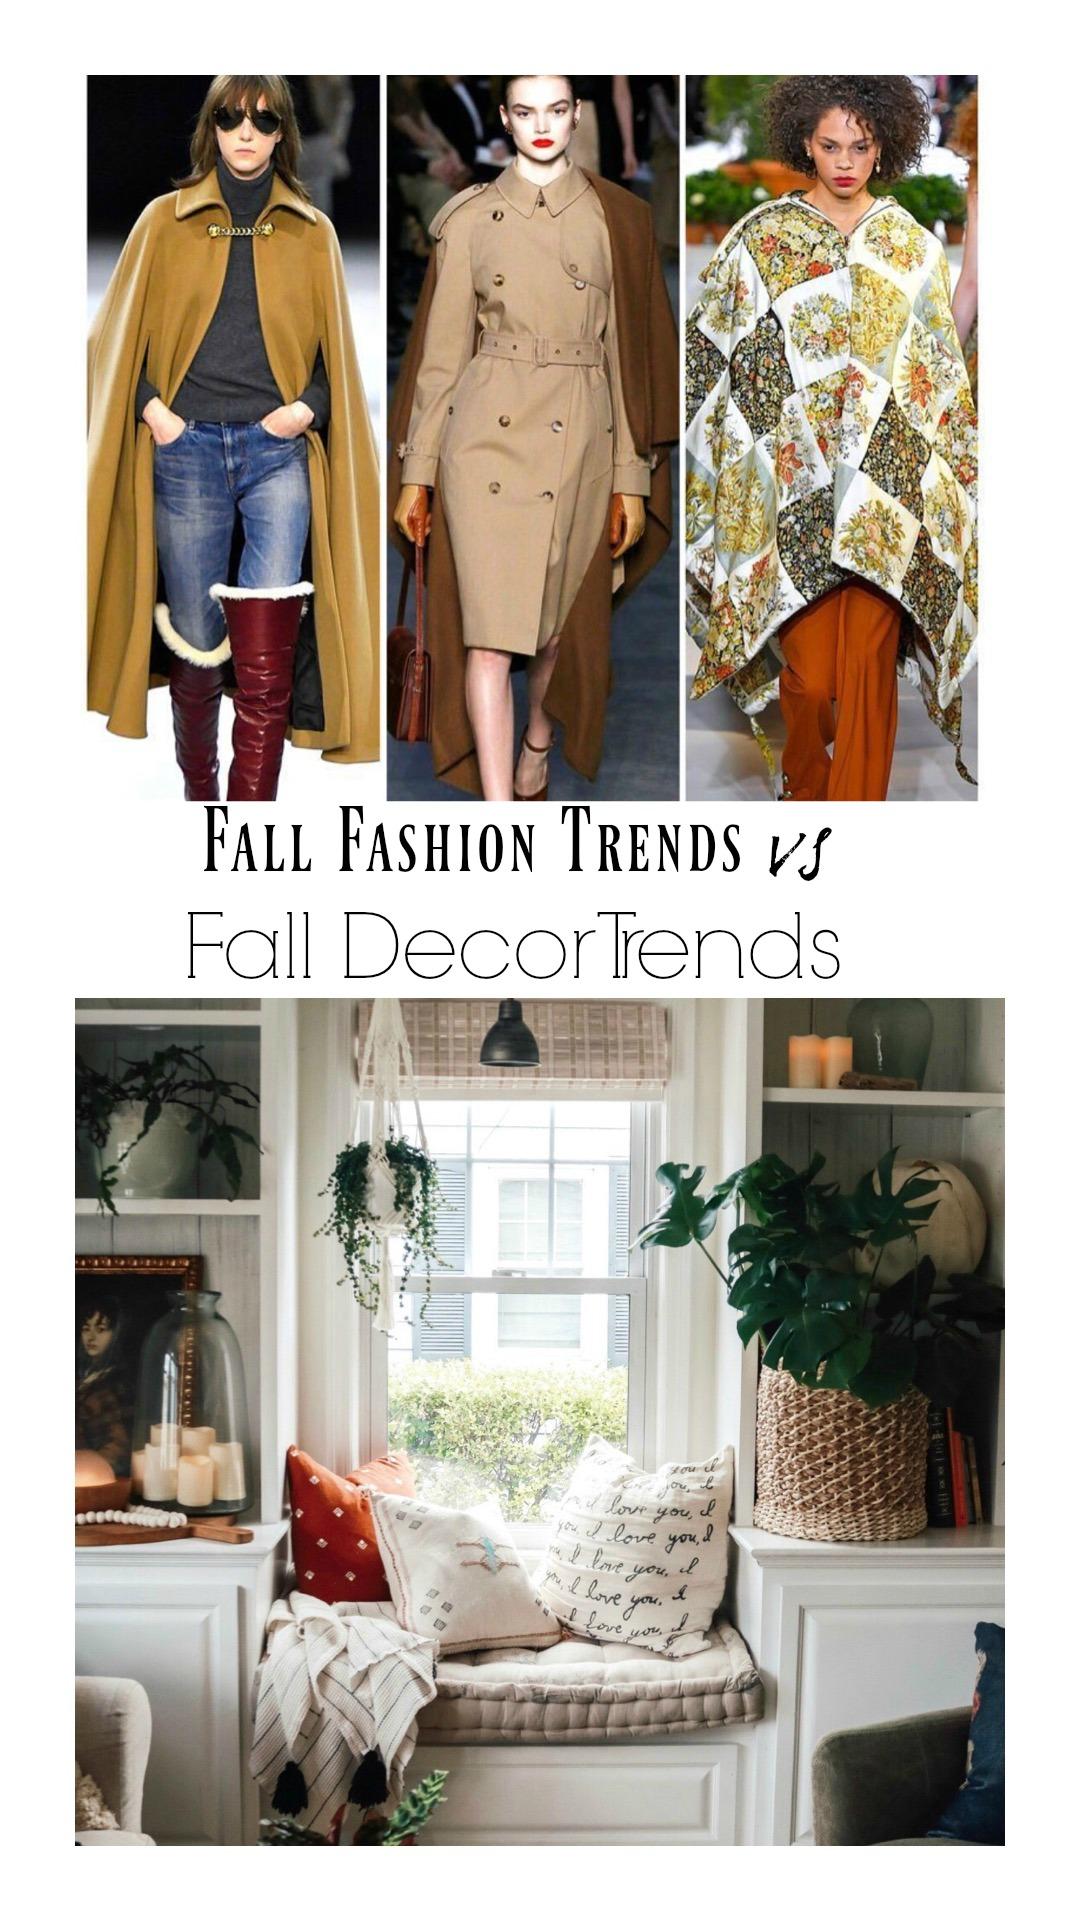 Fall Decor Trends vs Fall Fashion Trends